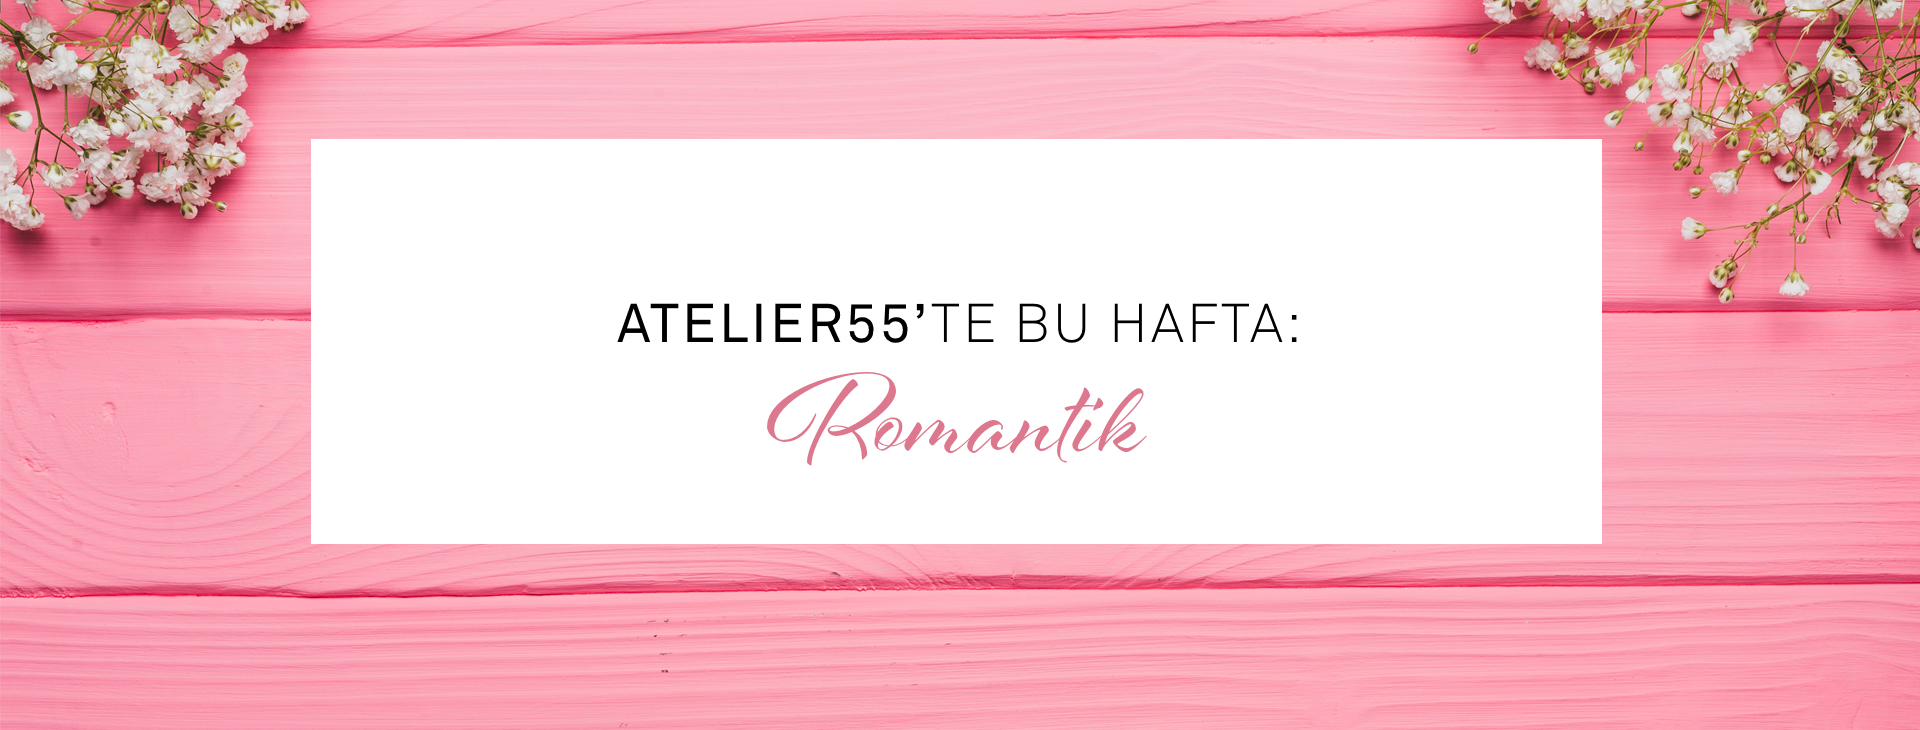 Atelier 55 'te Bu Hafta: Romantic